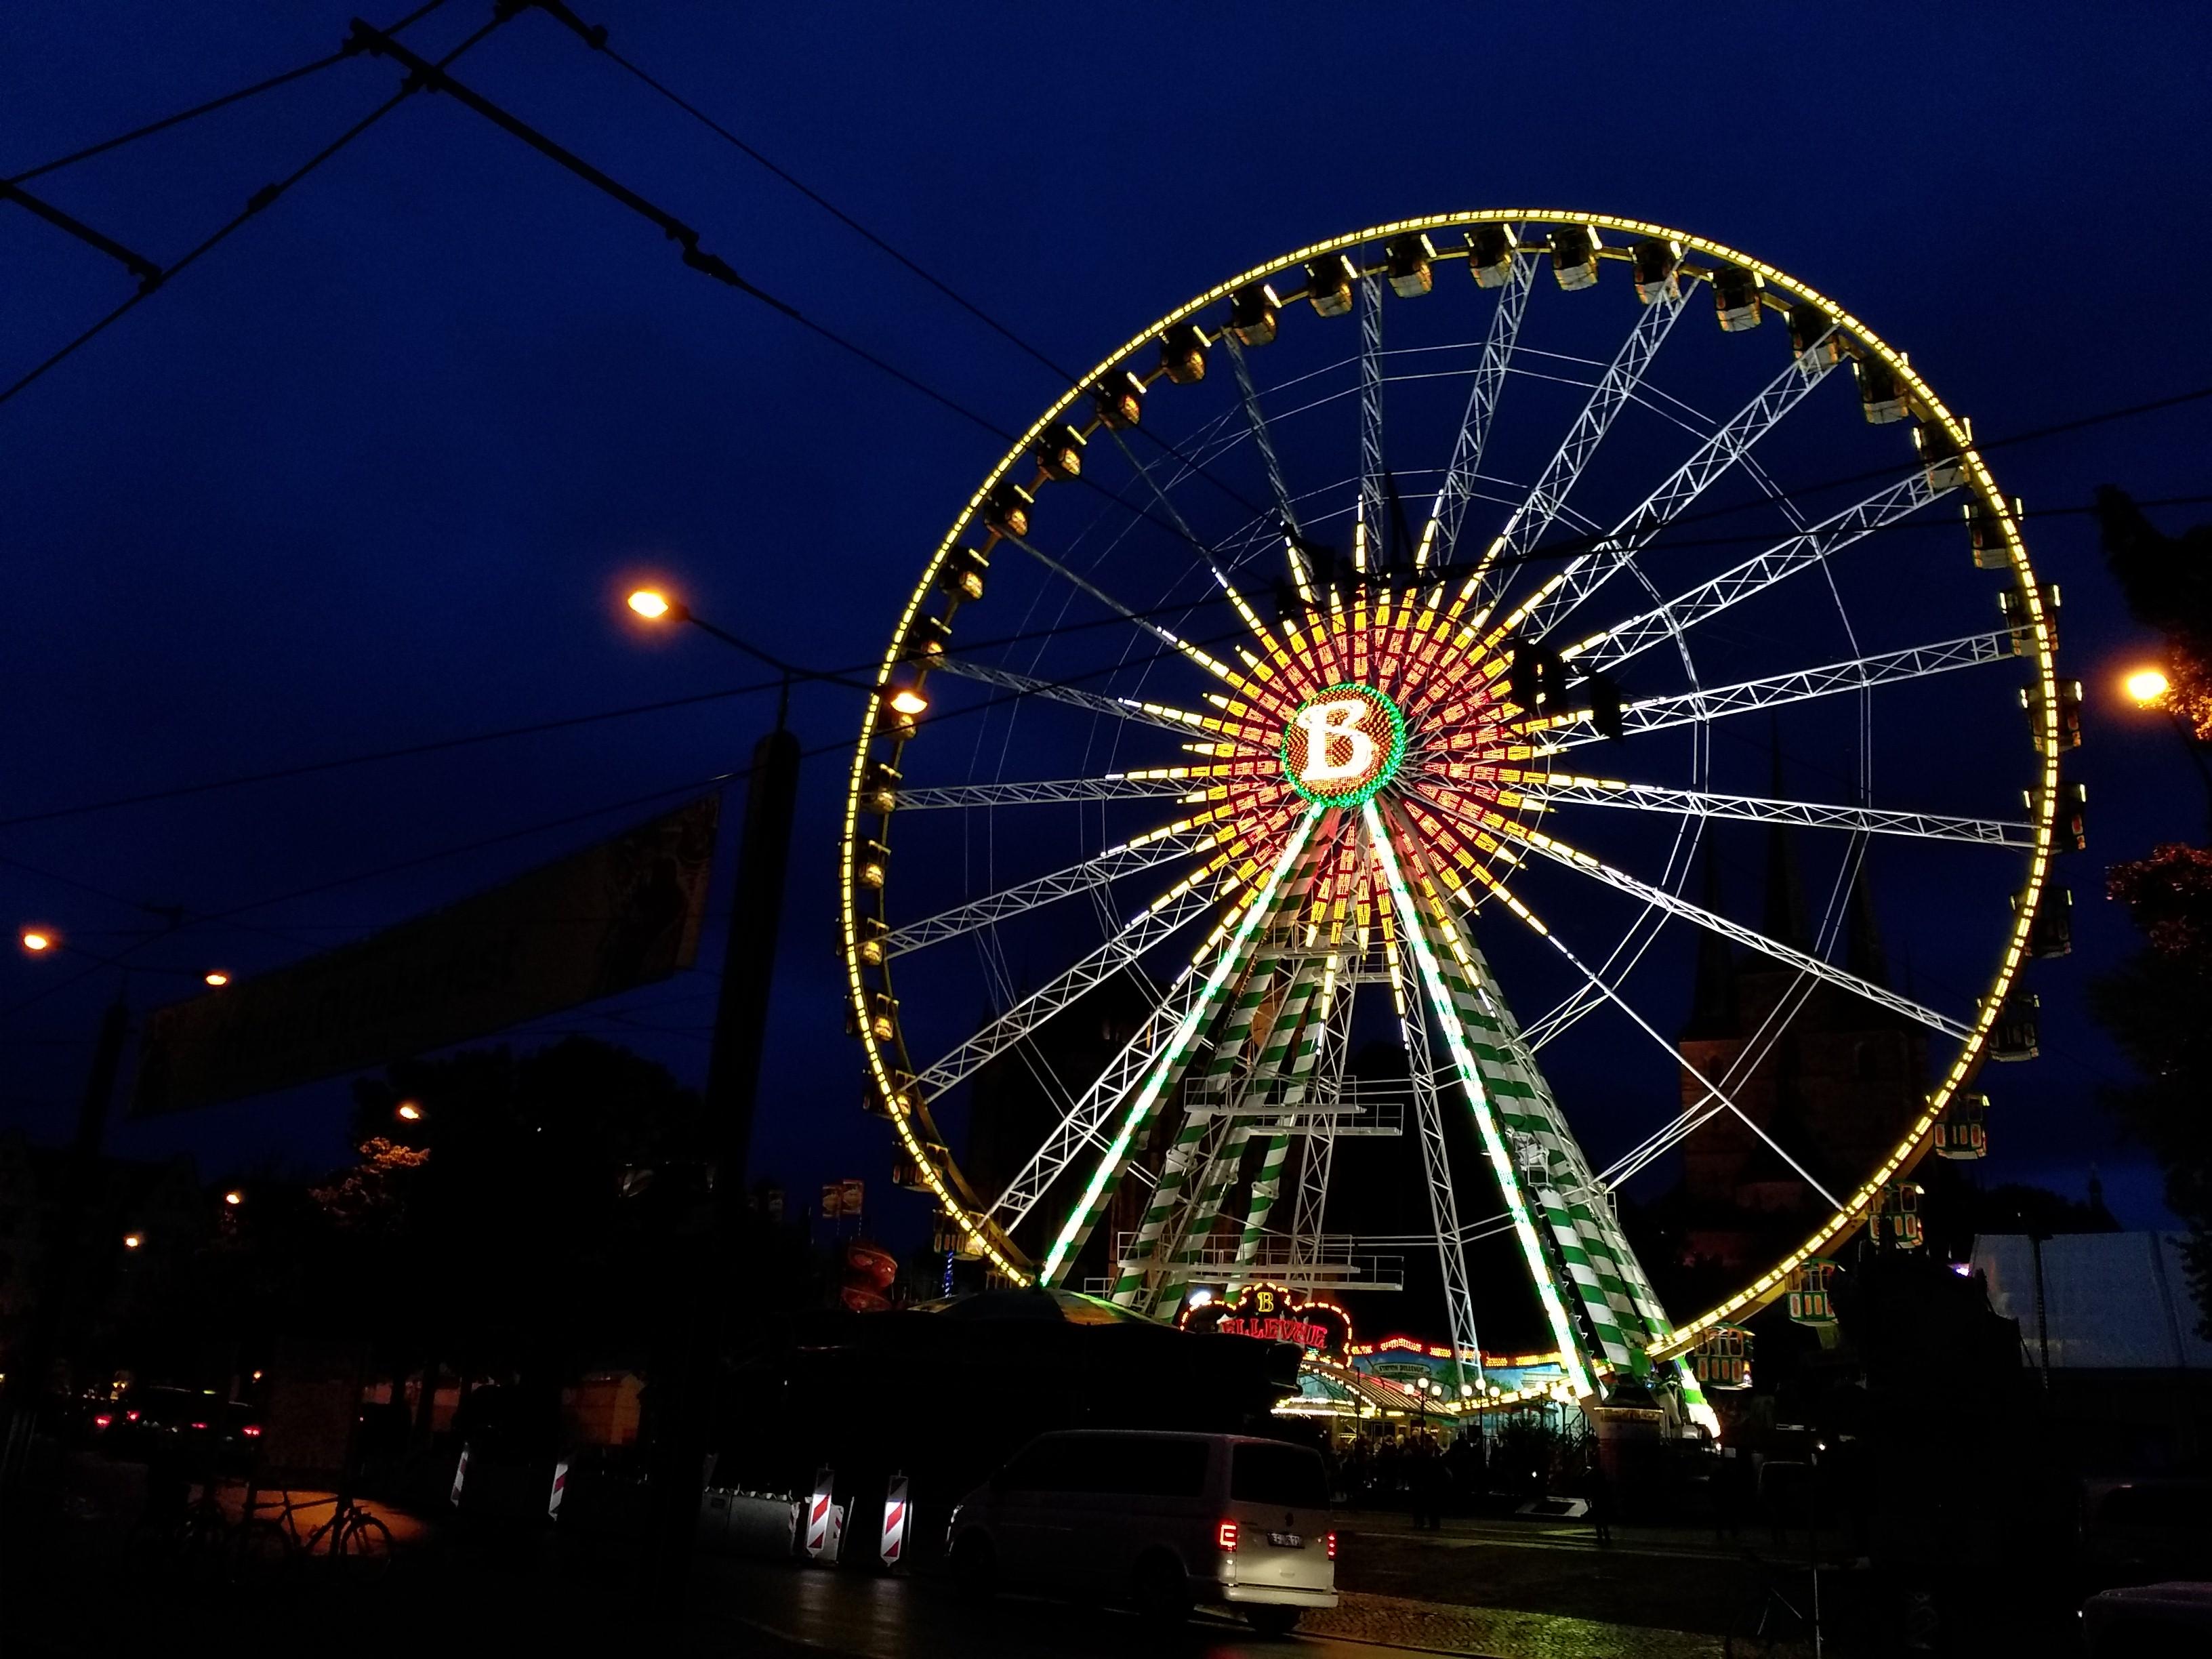 Oktoberfest Erfurt 2019, Erfurter Oktoberfest 2019